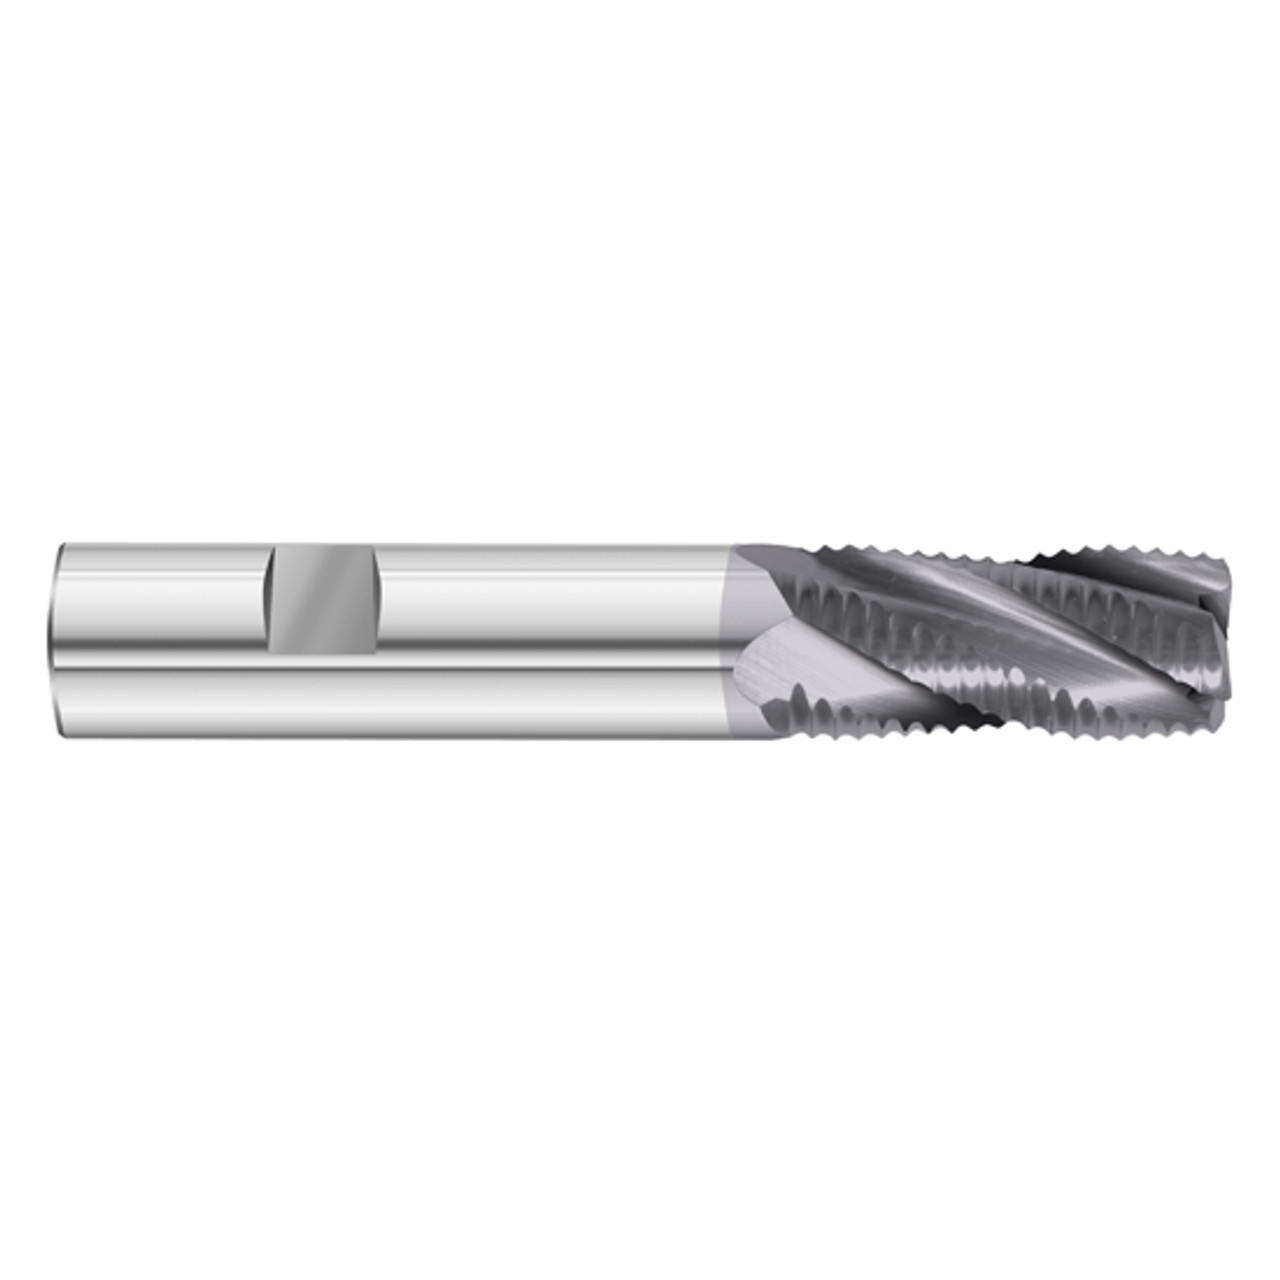 Fullerton Tool 91874 10mm Diameter x 10mm Shank x 25mm LOC x 64mm OAL 4 Flute TiAlN Solid Carbide Radius End Mill